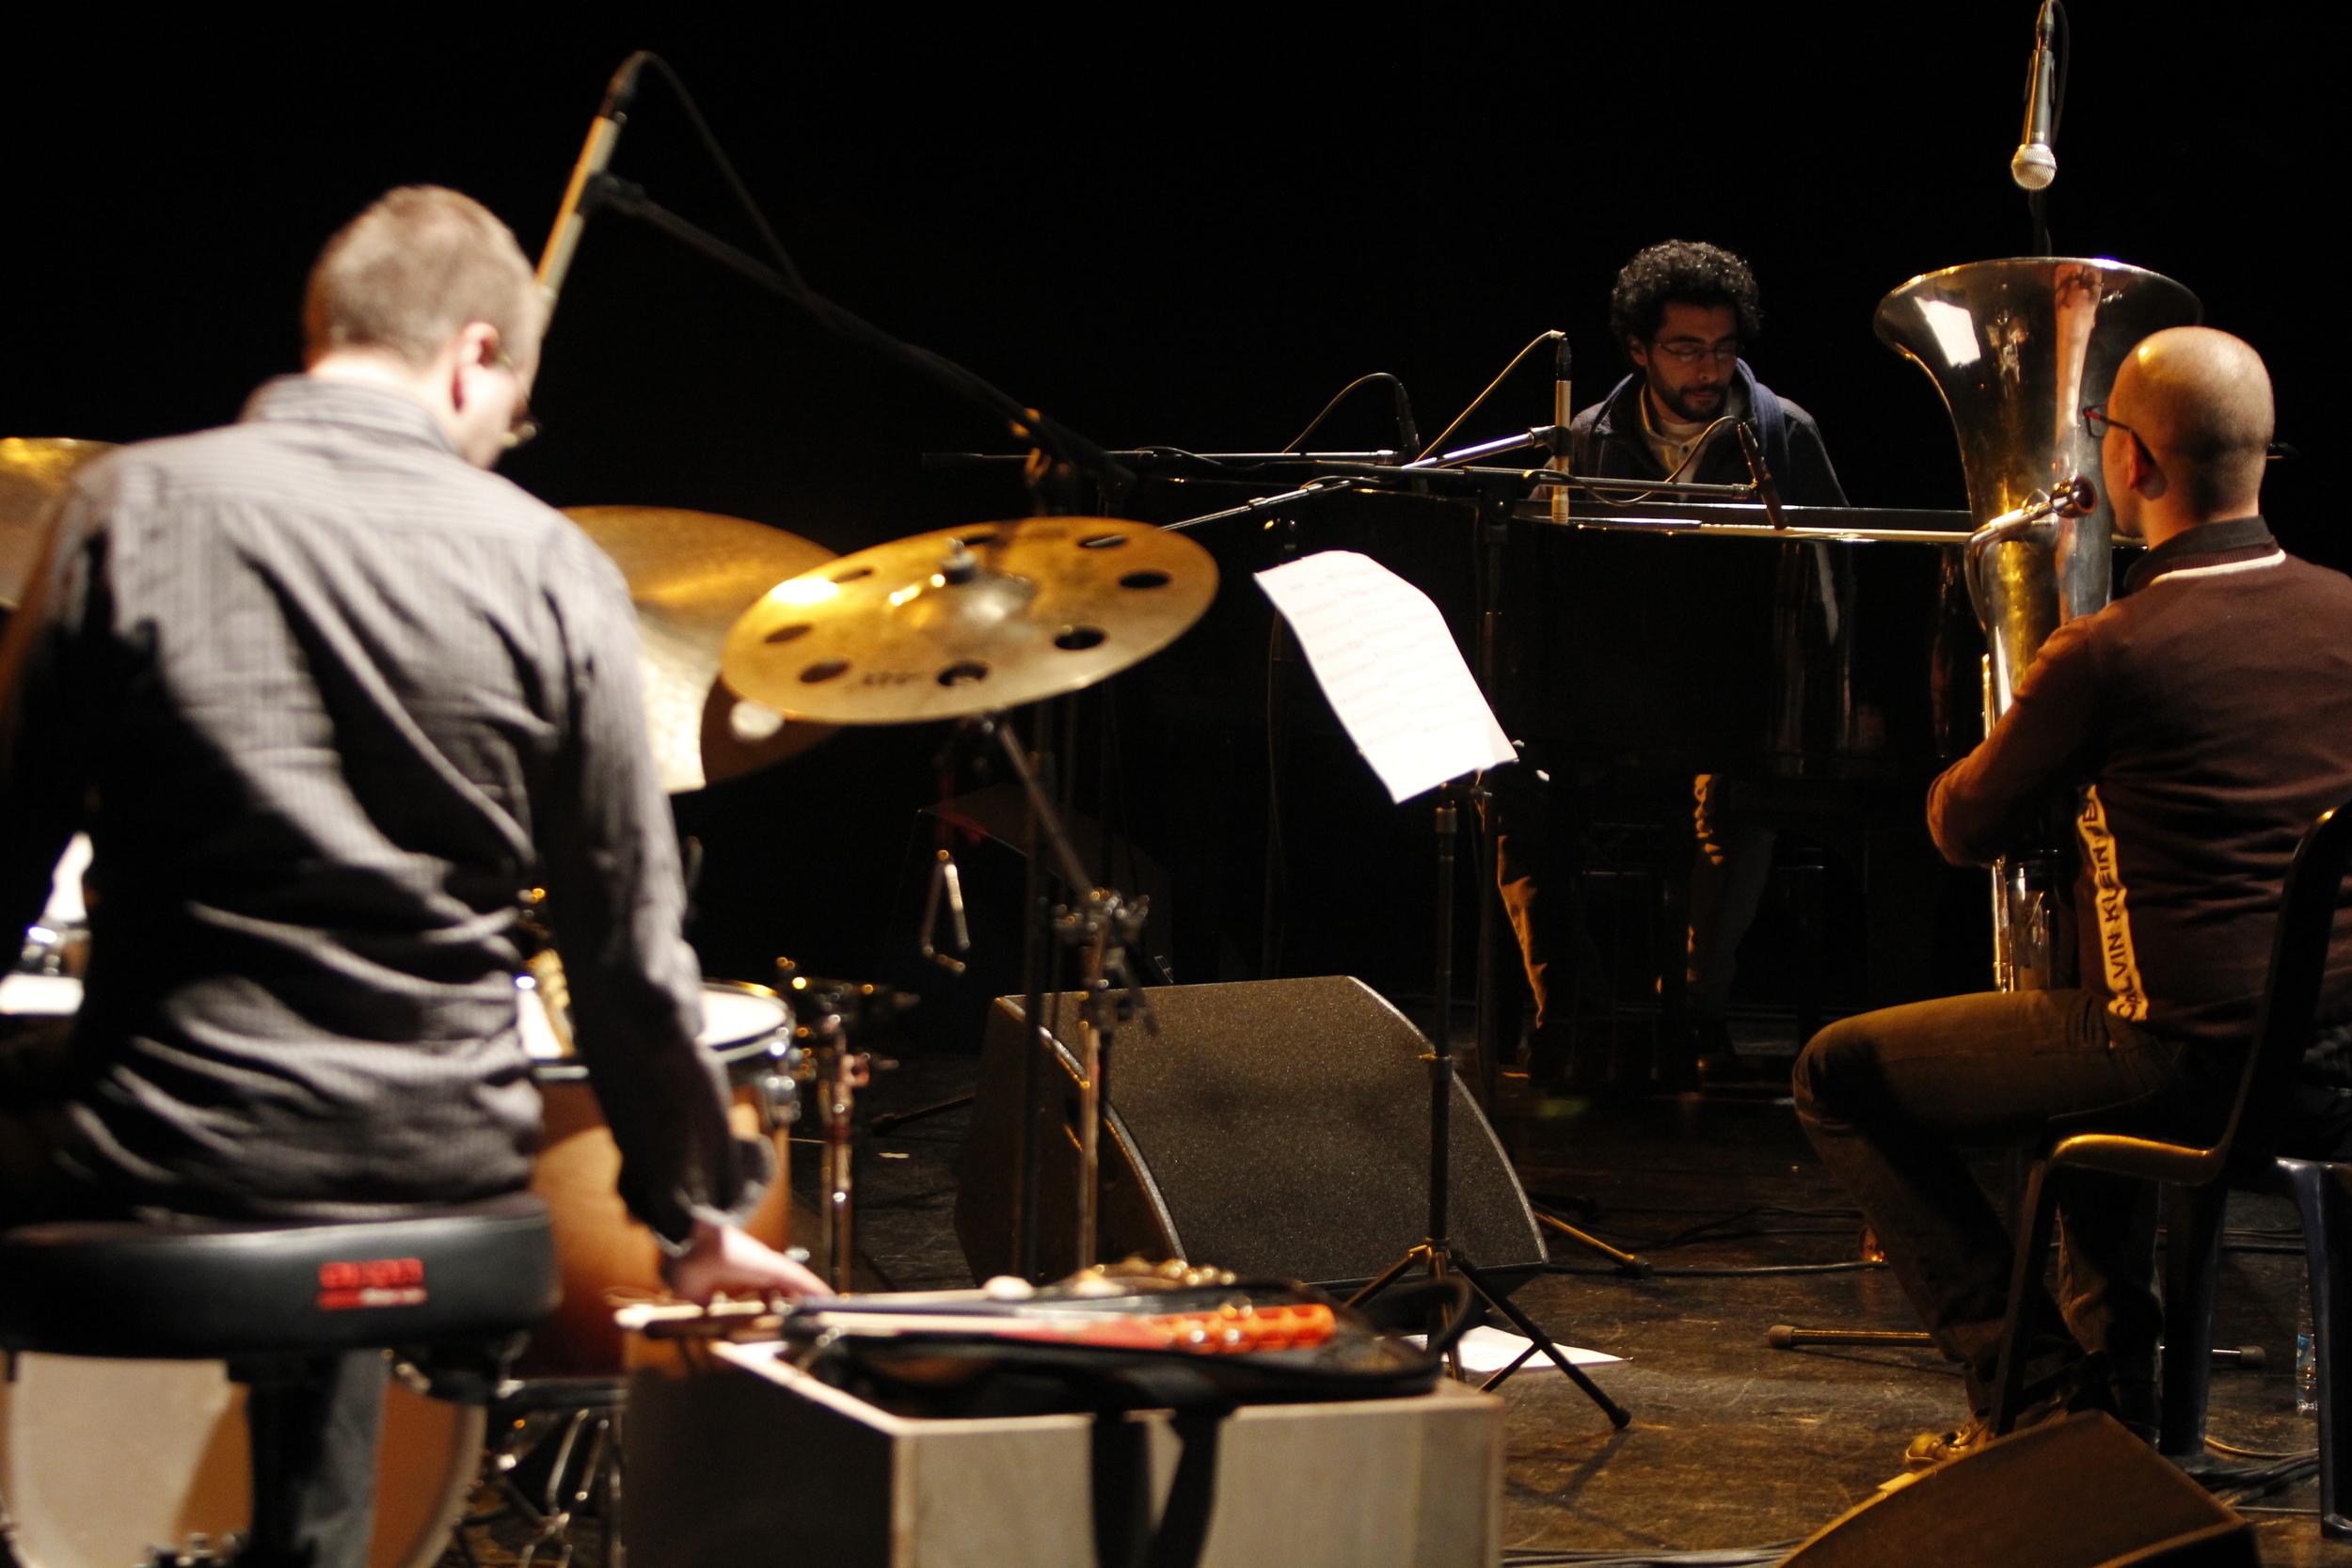 Sunflower Theater - Beirut /photo by Houssam Mchaimech Tarek Yamani, Goran Krmac, Kristijan Krajncan